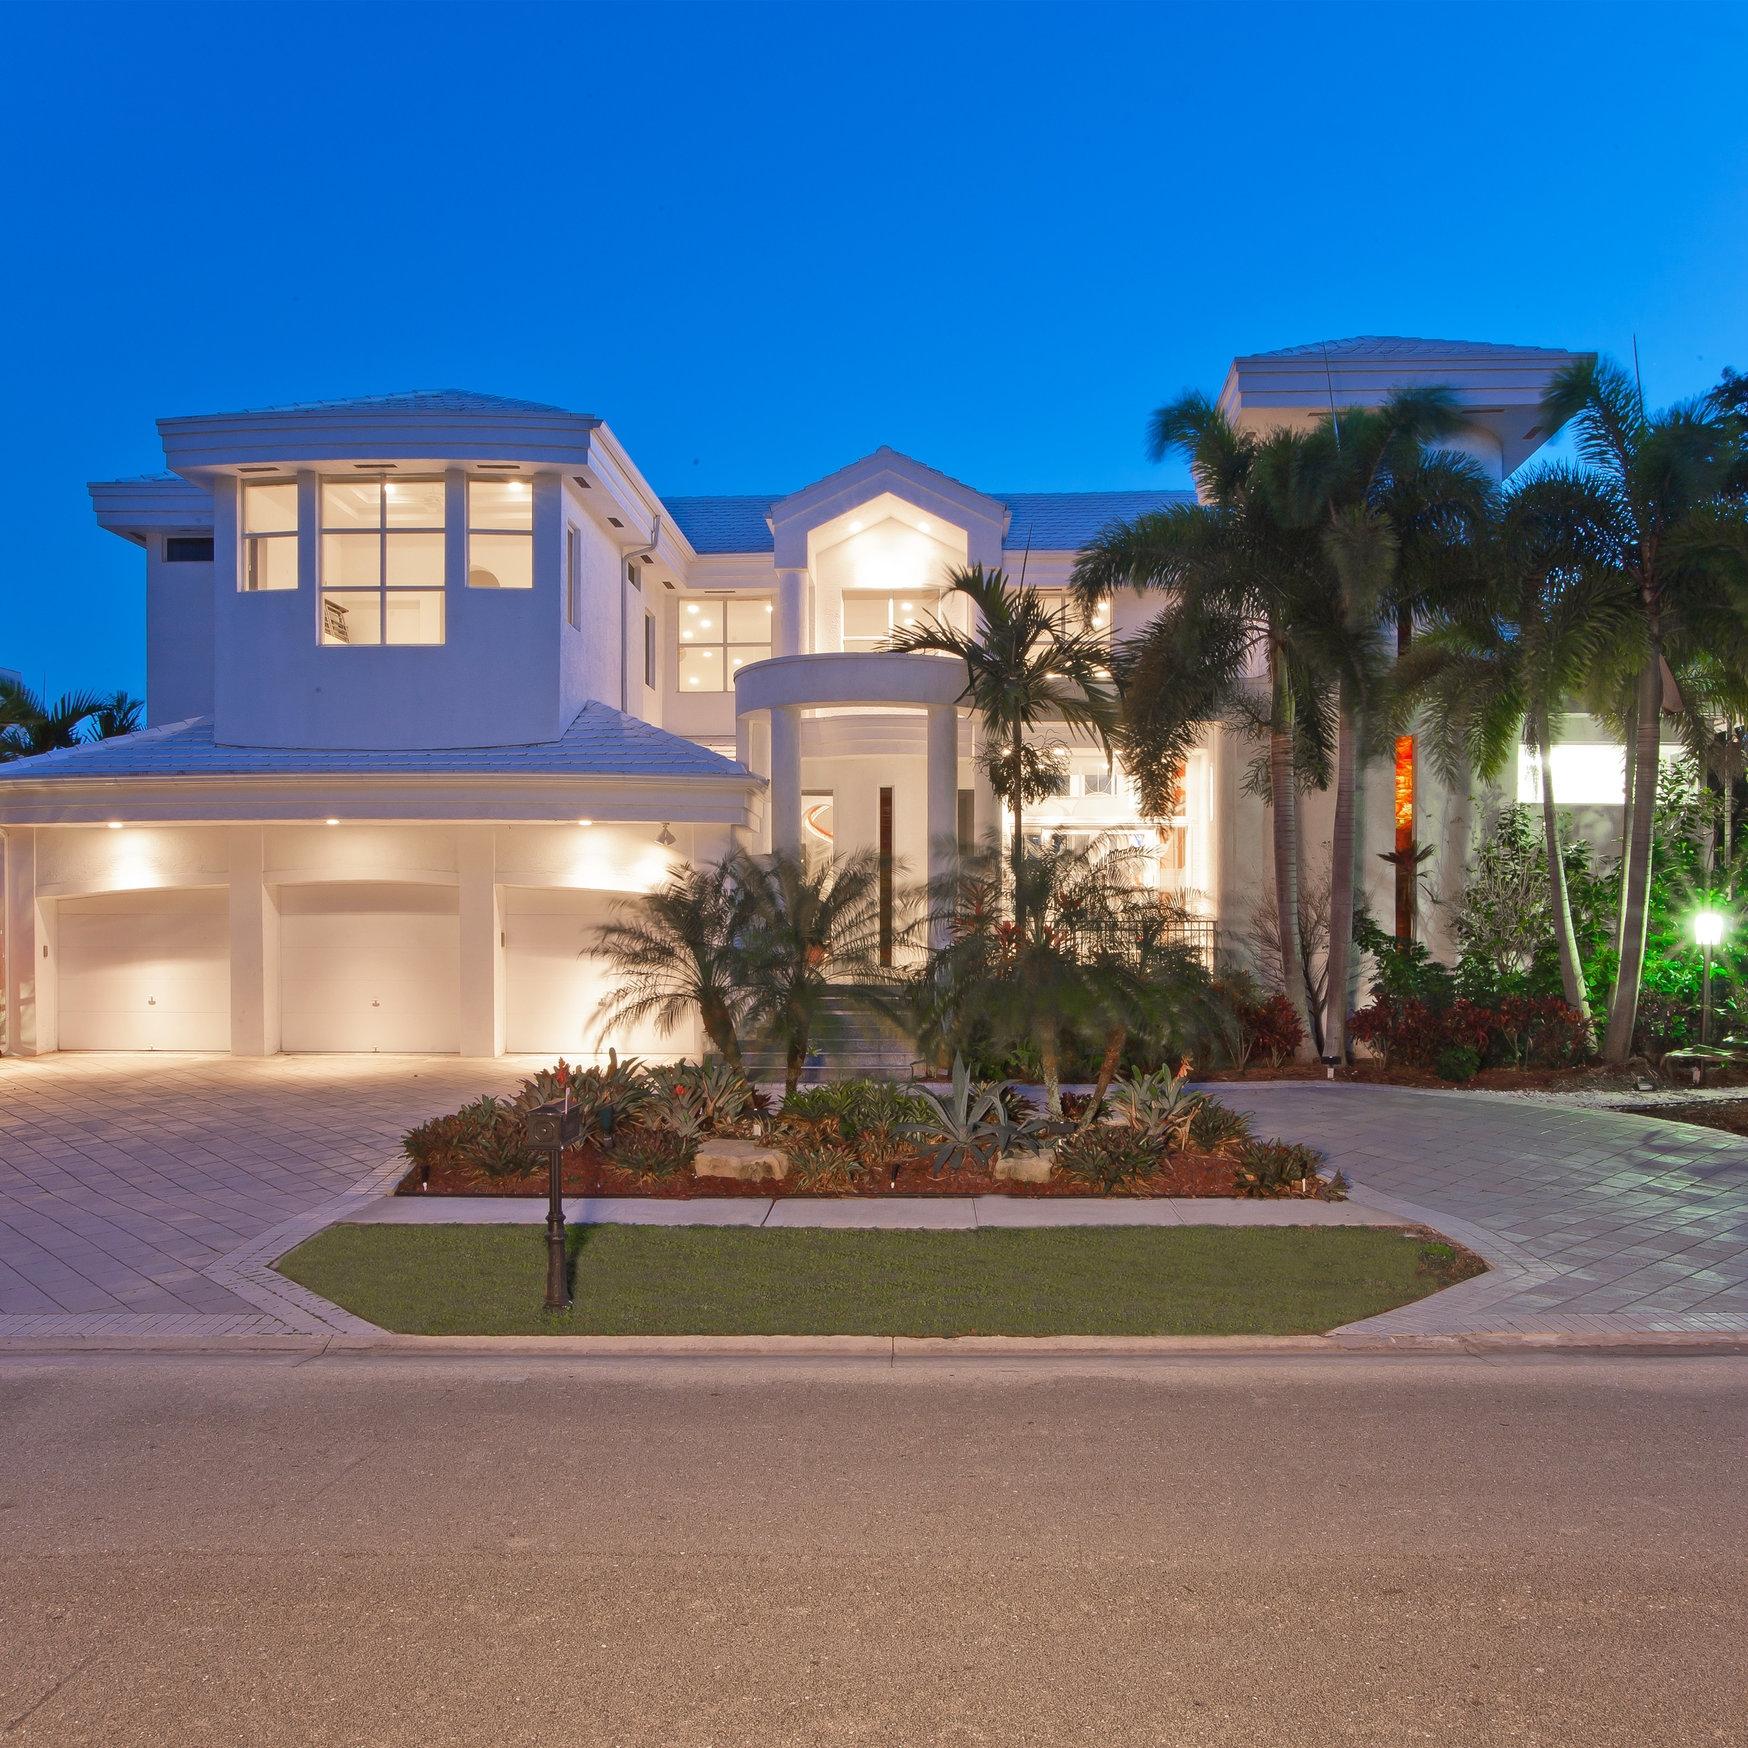 contemporary-white-exterior-home-florida-architecture.jpg